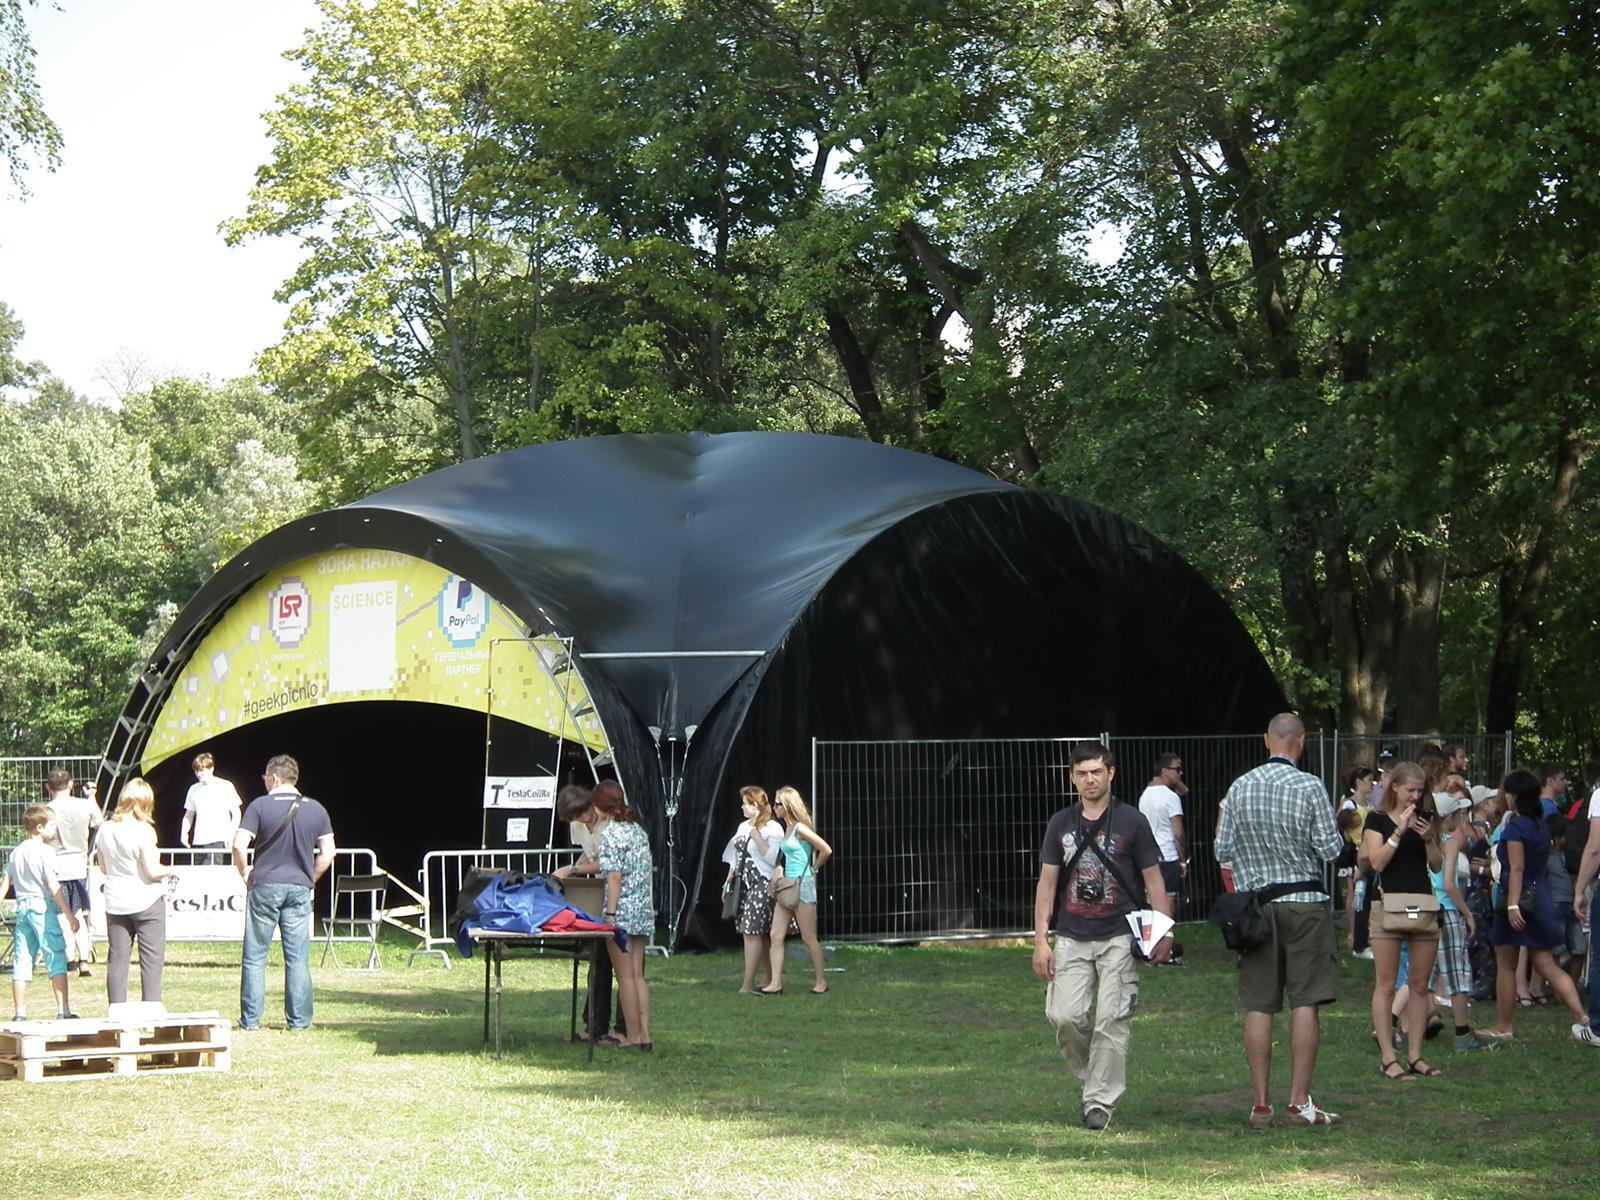 Черный арочный шатер 10х10м top Blackout